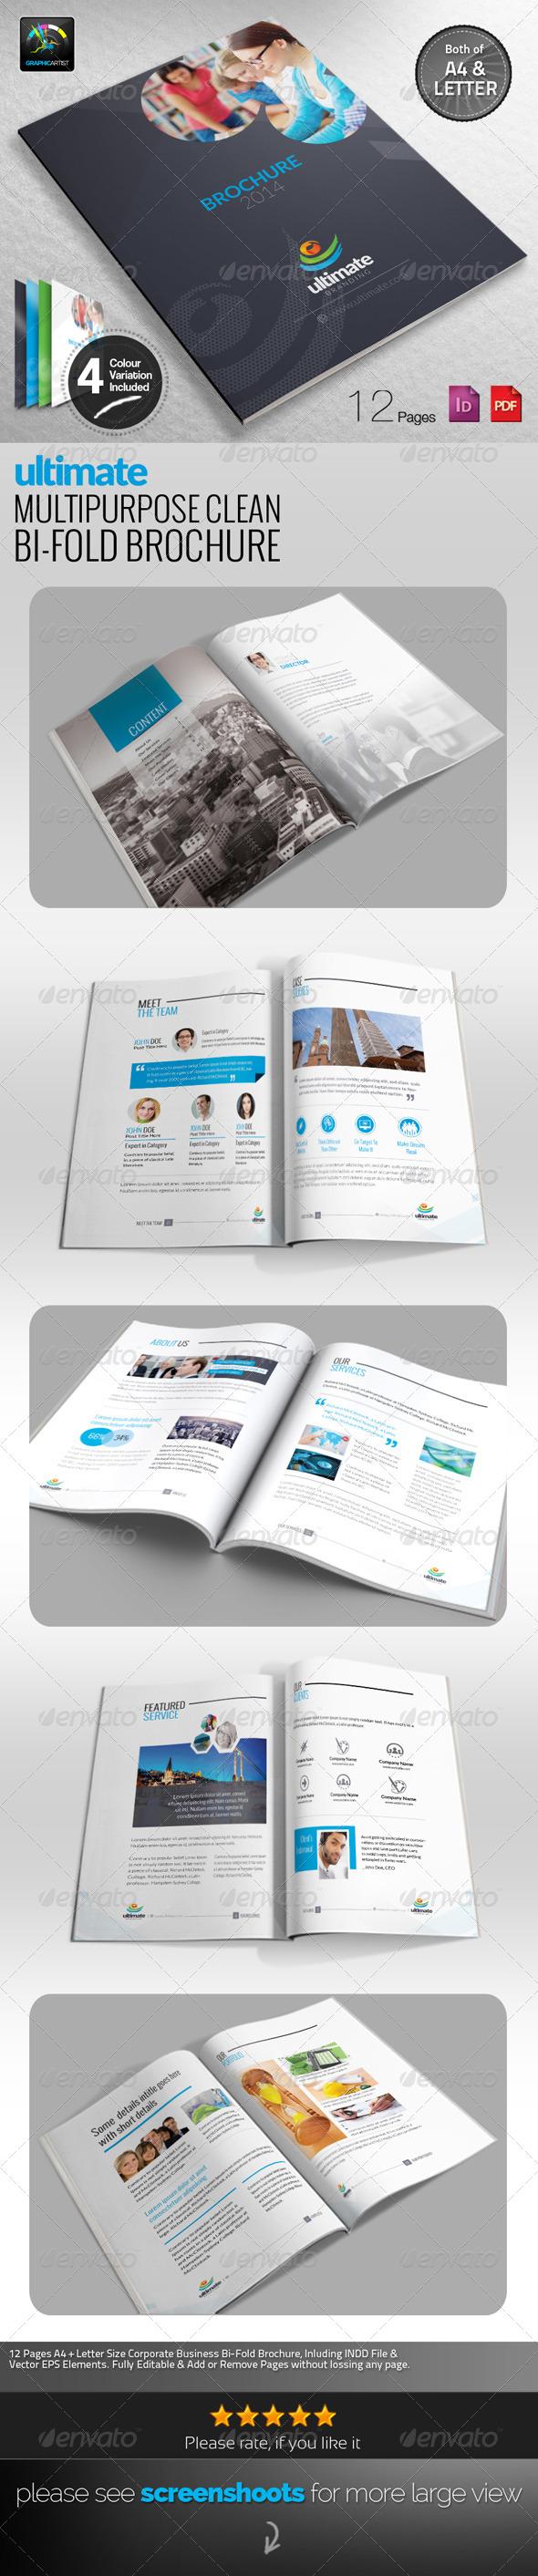 GraphicRiver Ultimate Multipurpose Clean Bi-Fold Brochure 6574831